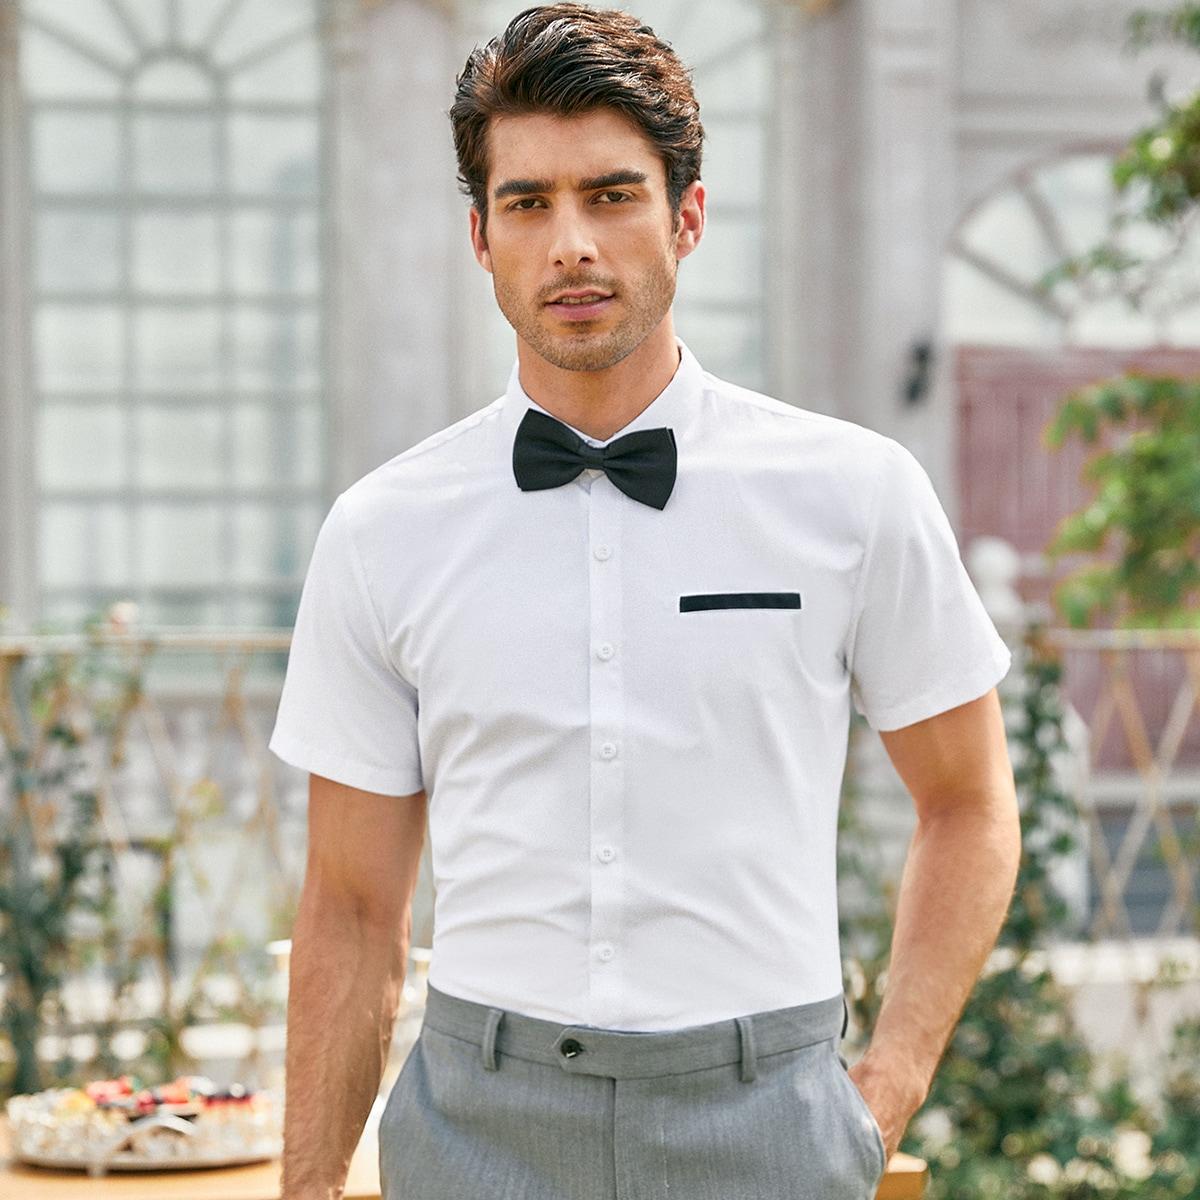 Пуговица Работа Мужские рубашки